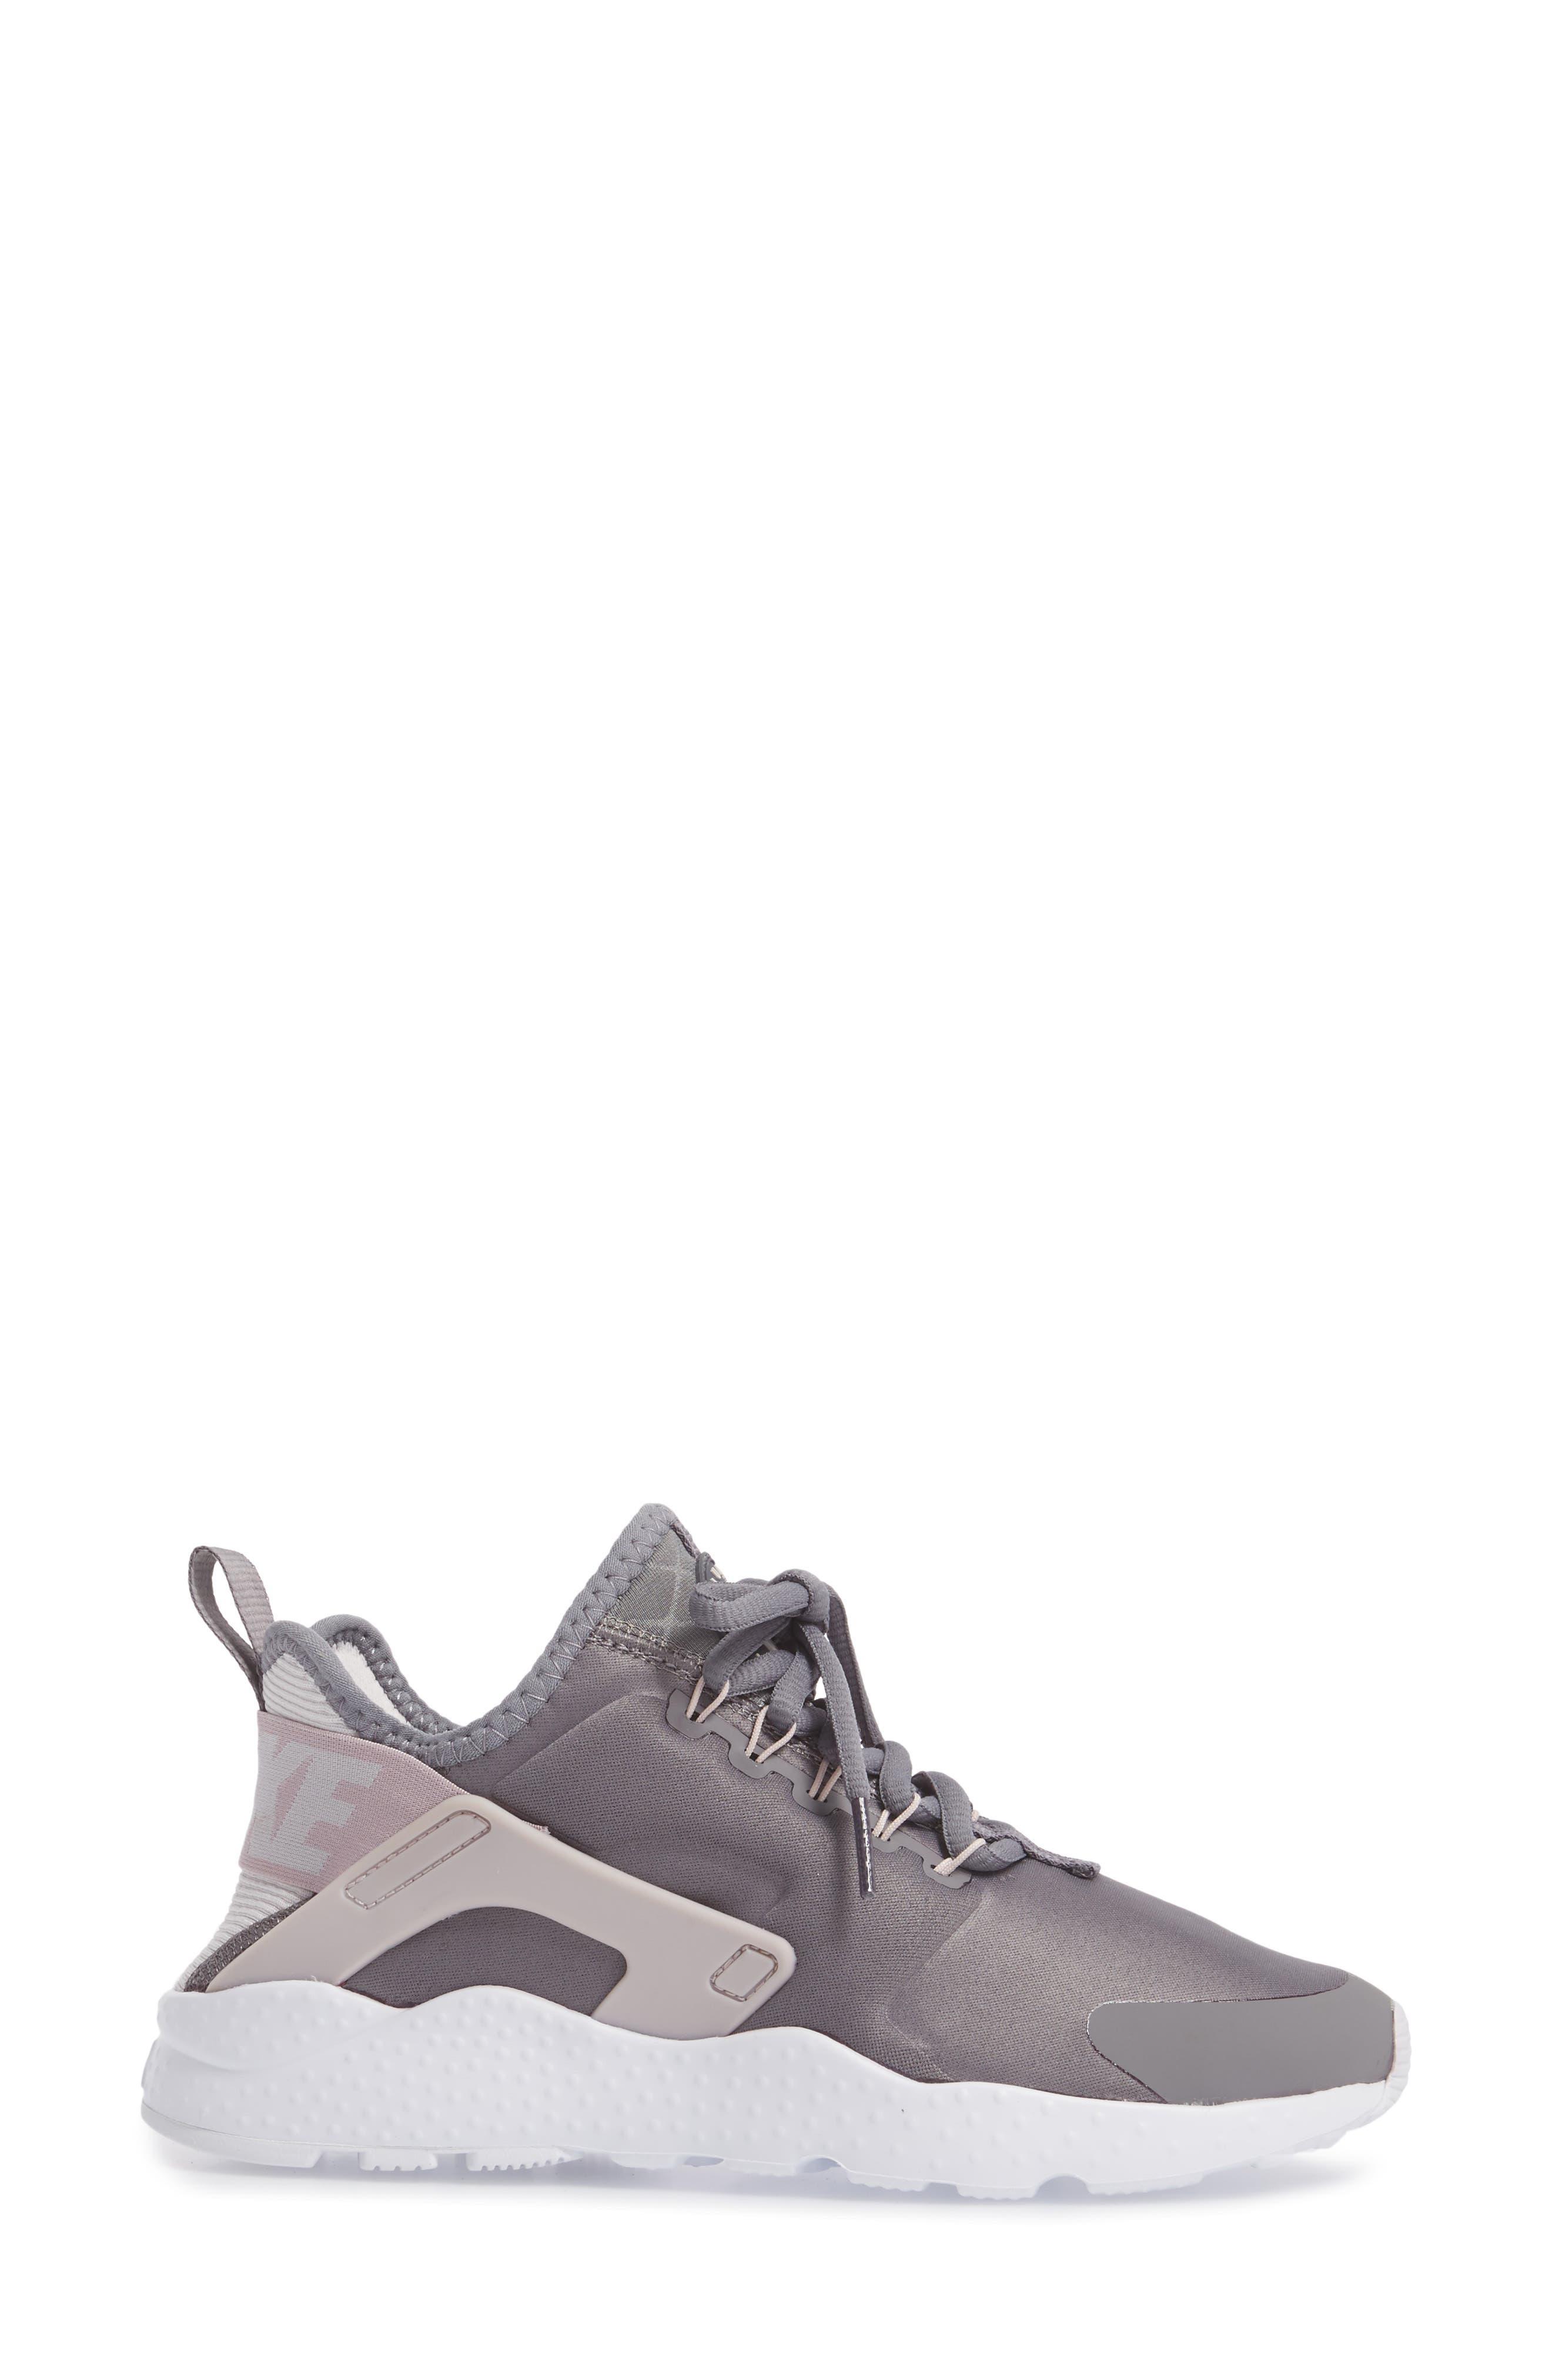 Air Huarache Sneaker,                             Alternate thumbnail 3, color,                             026